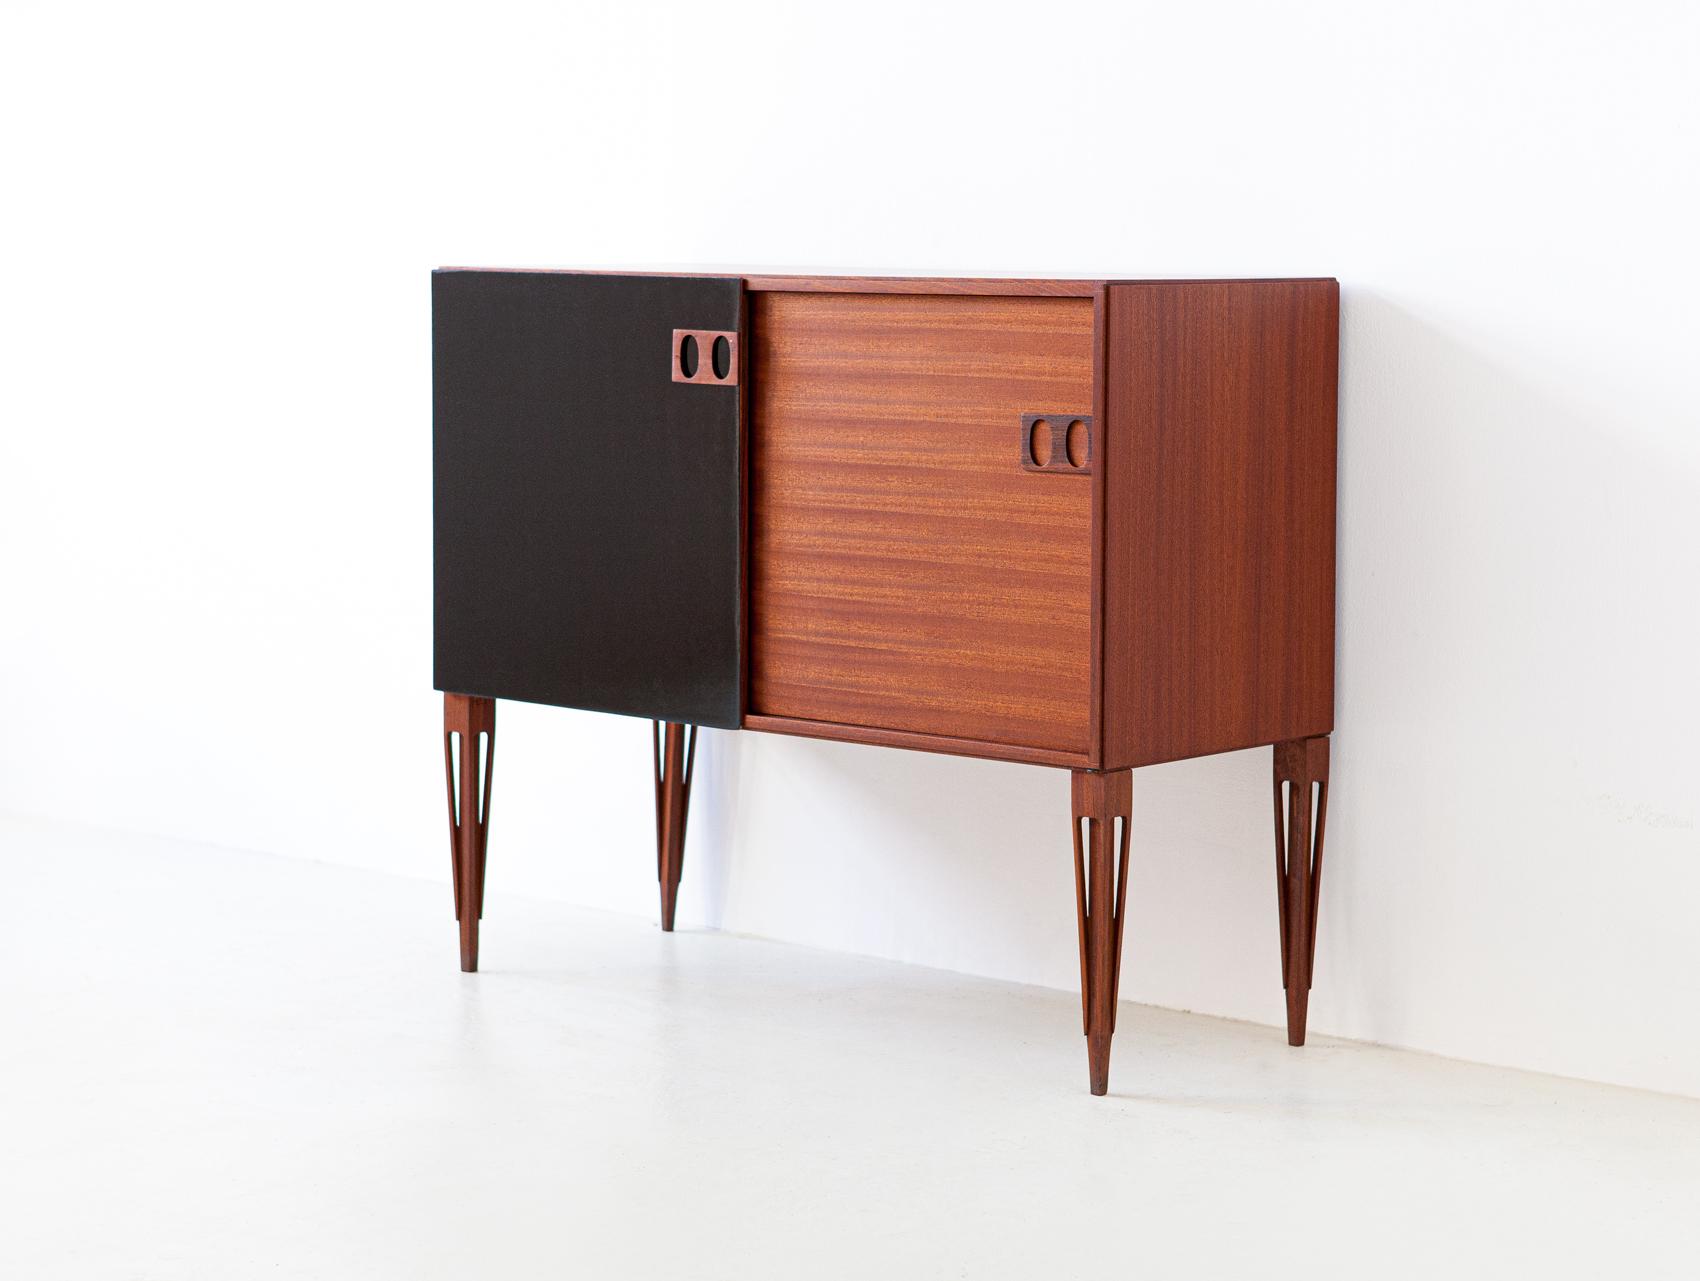 1950s-italian-mahogany-sideboard-by-fratelli-proserpio-7-st120